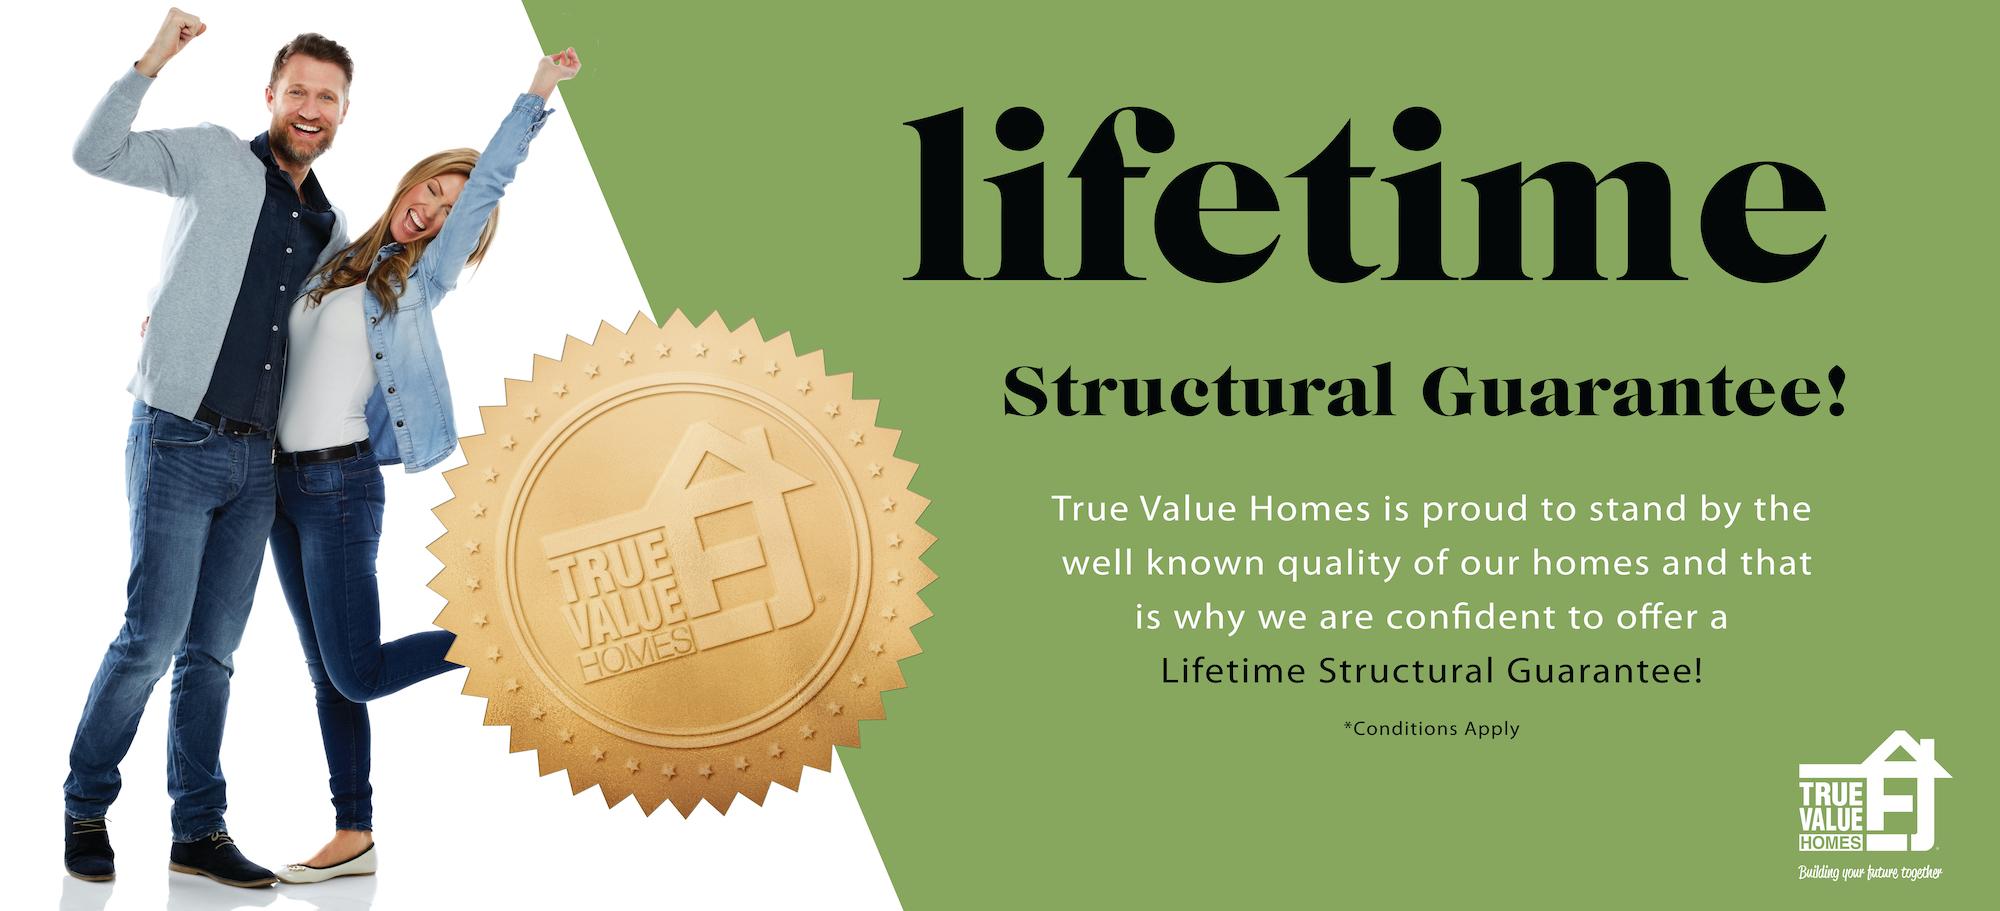 Lifetime Structural Guarantee!*